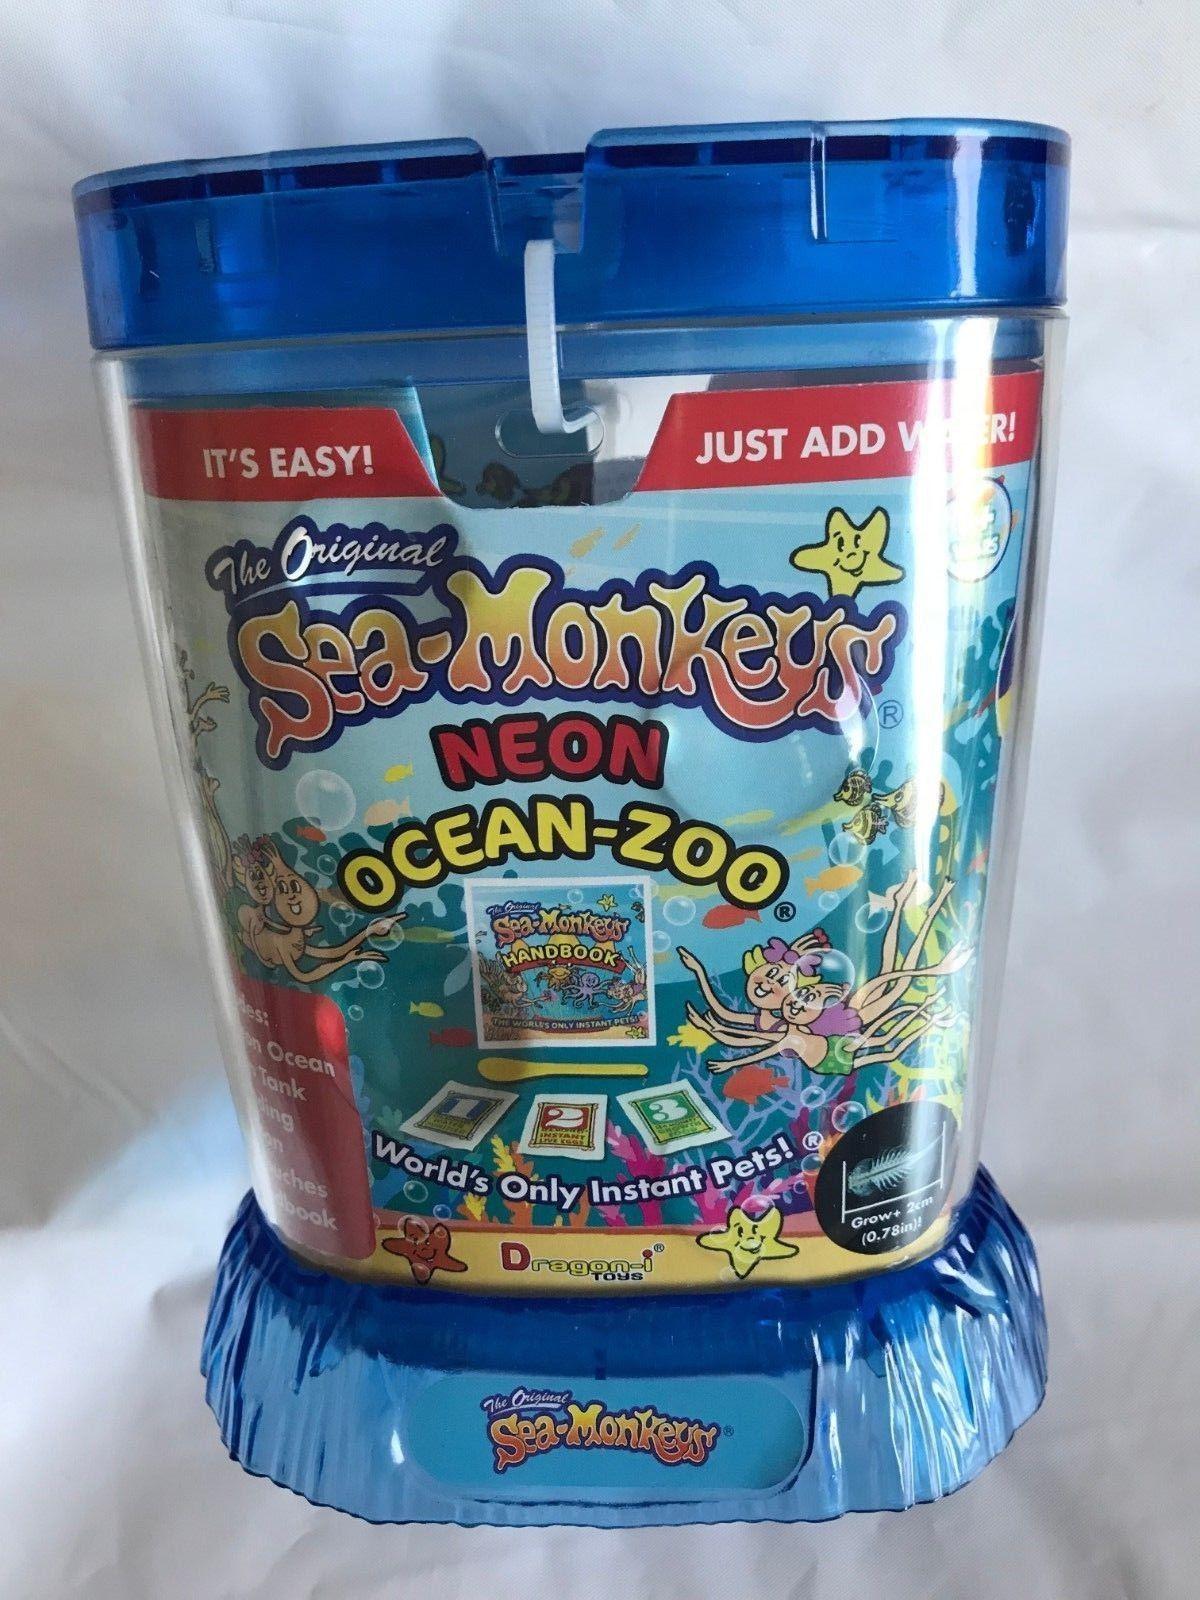 Animals And Nature 31744 Amazing Live Sea Monkeys Ocean Zoo Marine Aquarium Neon Blue 23232 Buy It Now Only 12 81 O Sea Monkeys Farm Animal Toys Zoo Toys